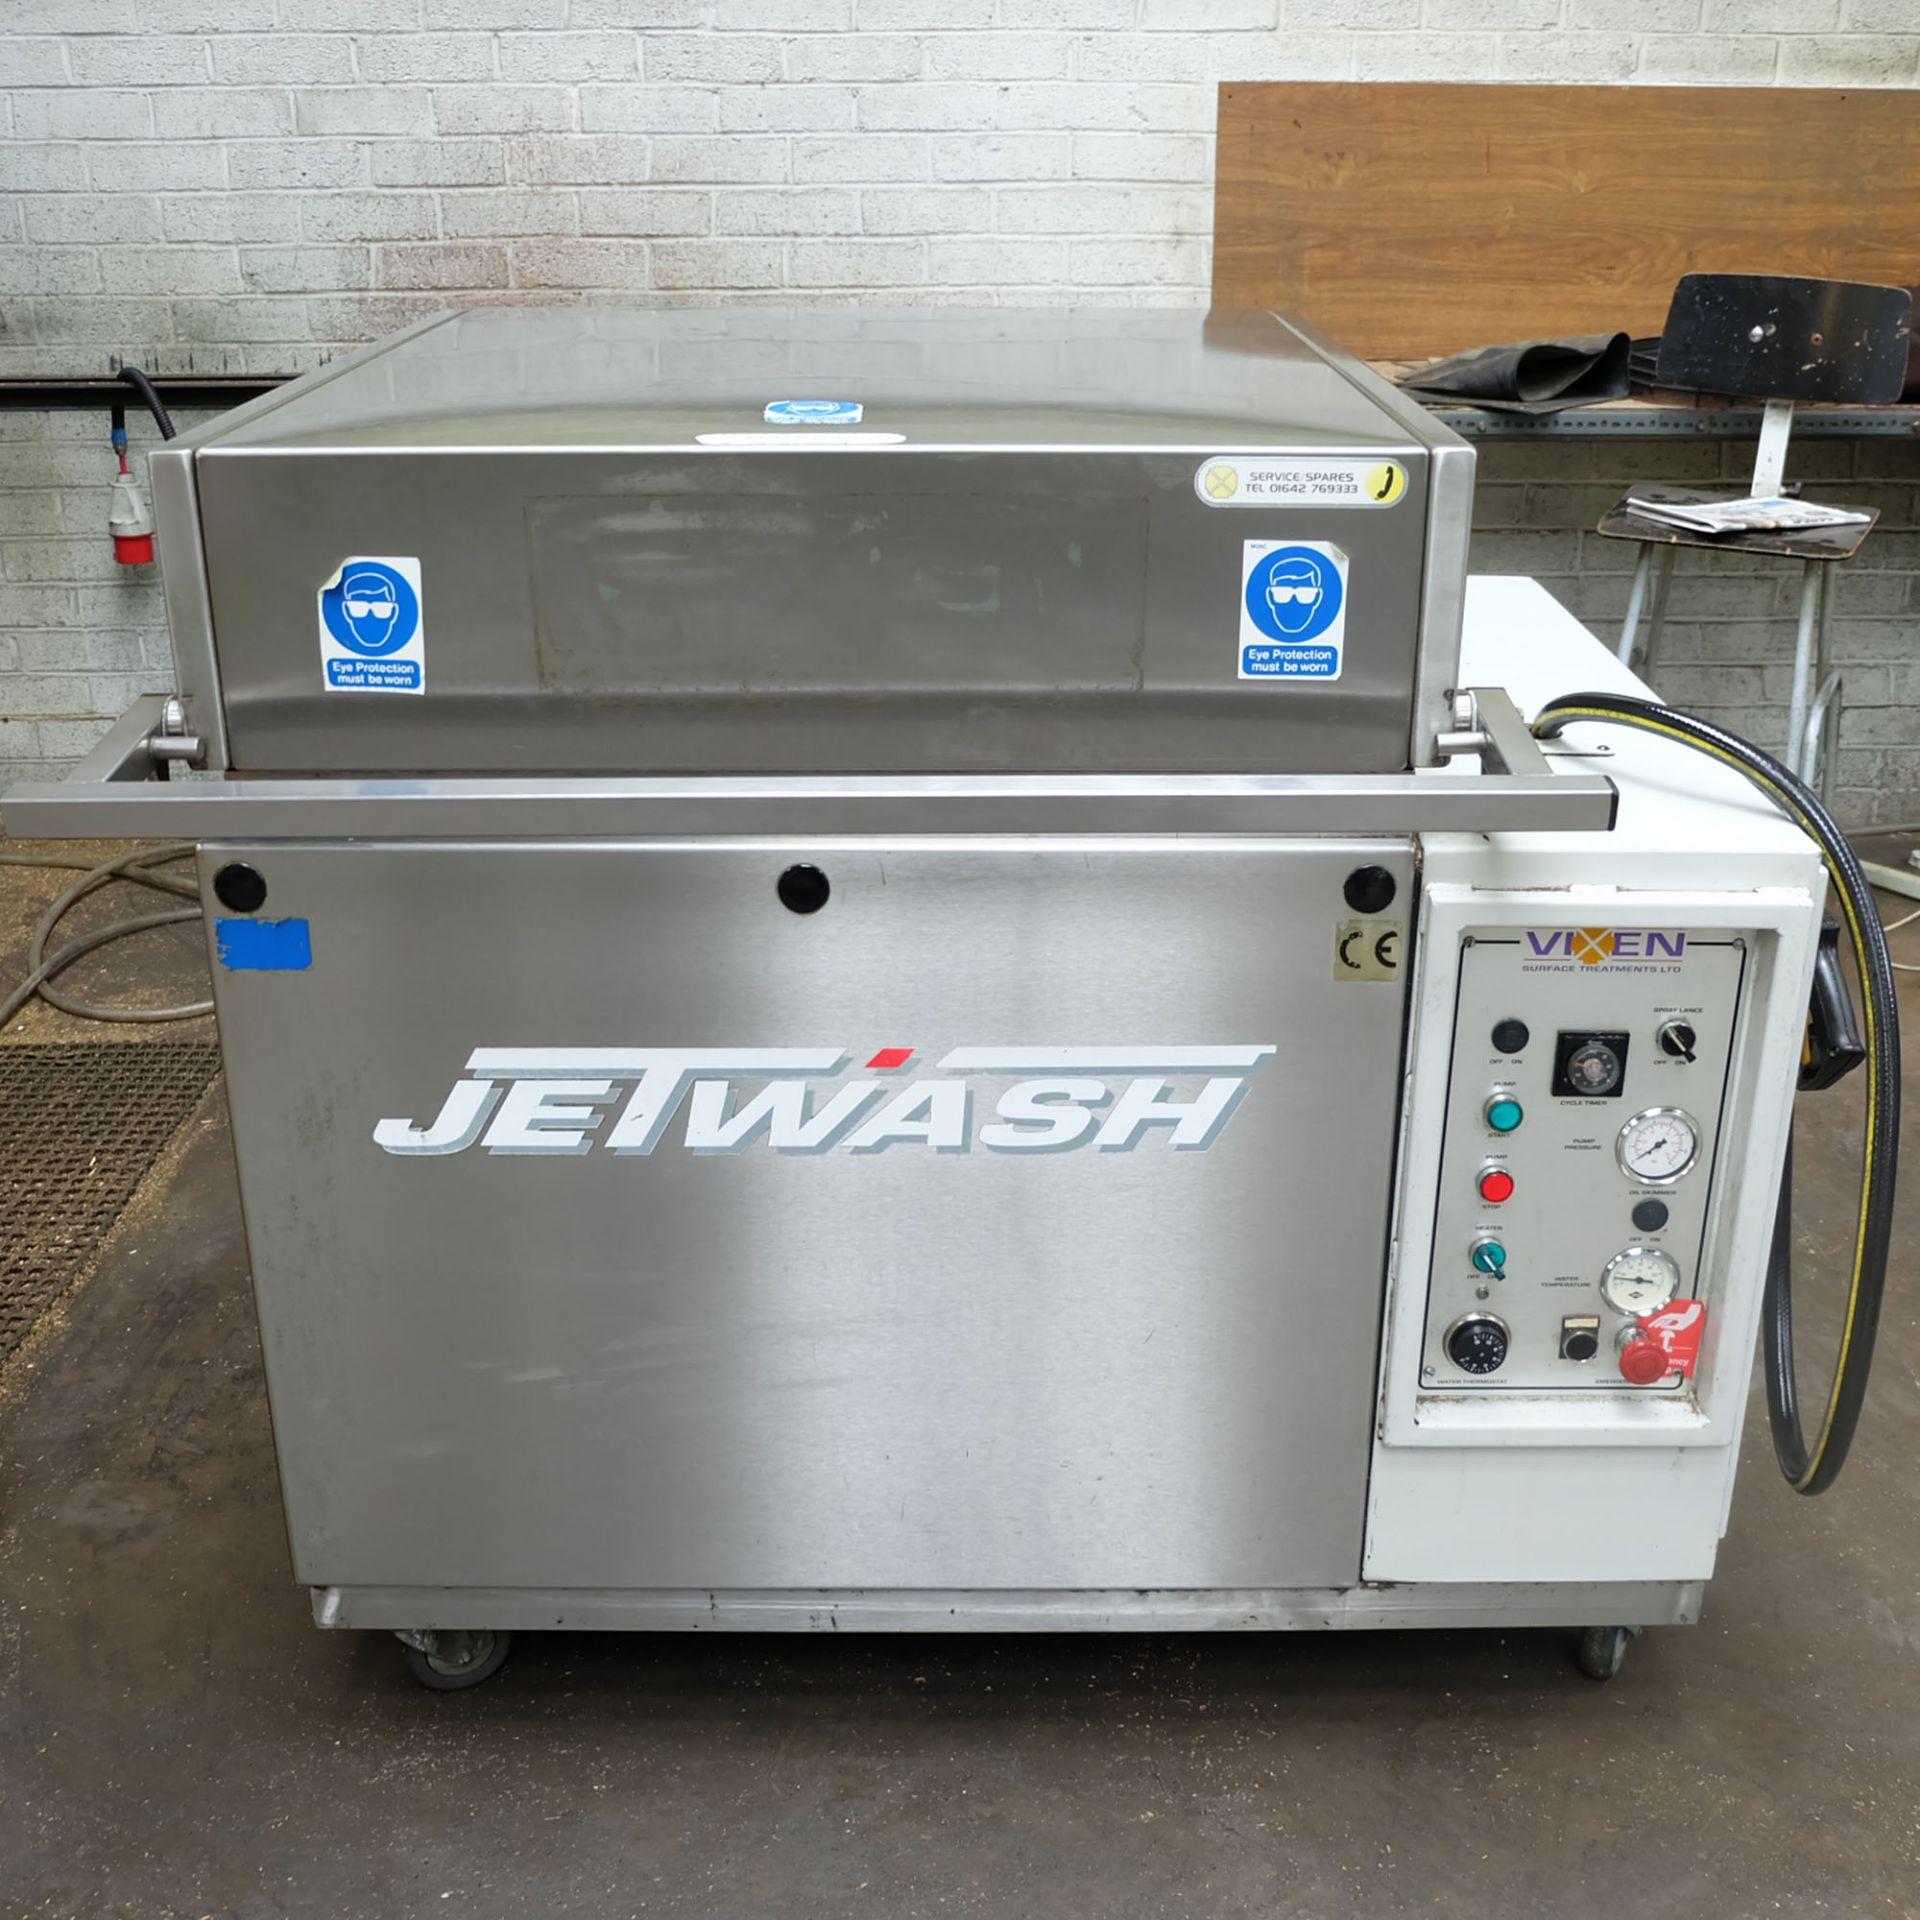 Vixen Jetwash Model JW60 Automatic Hot Wash Rotary Spray Machine. Bowl Size 600mm x 260mm. - Image 2 of 8